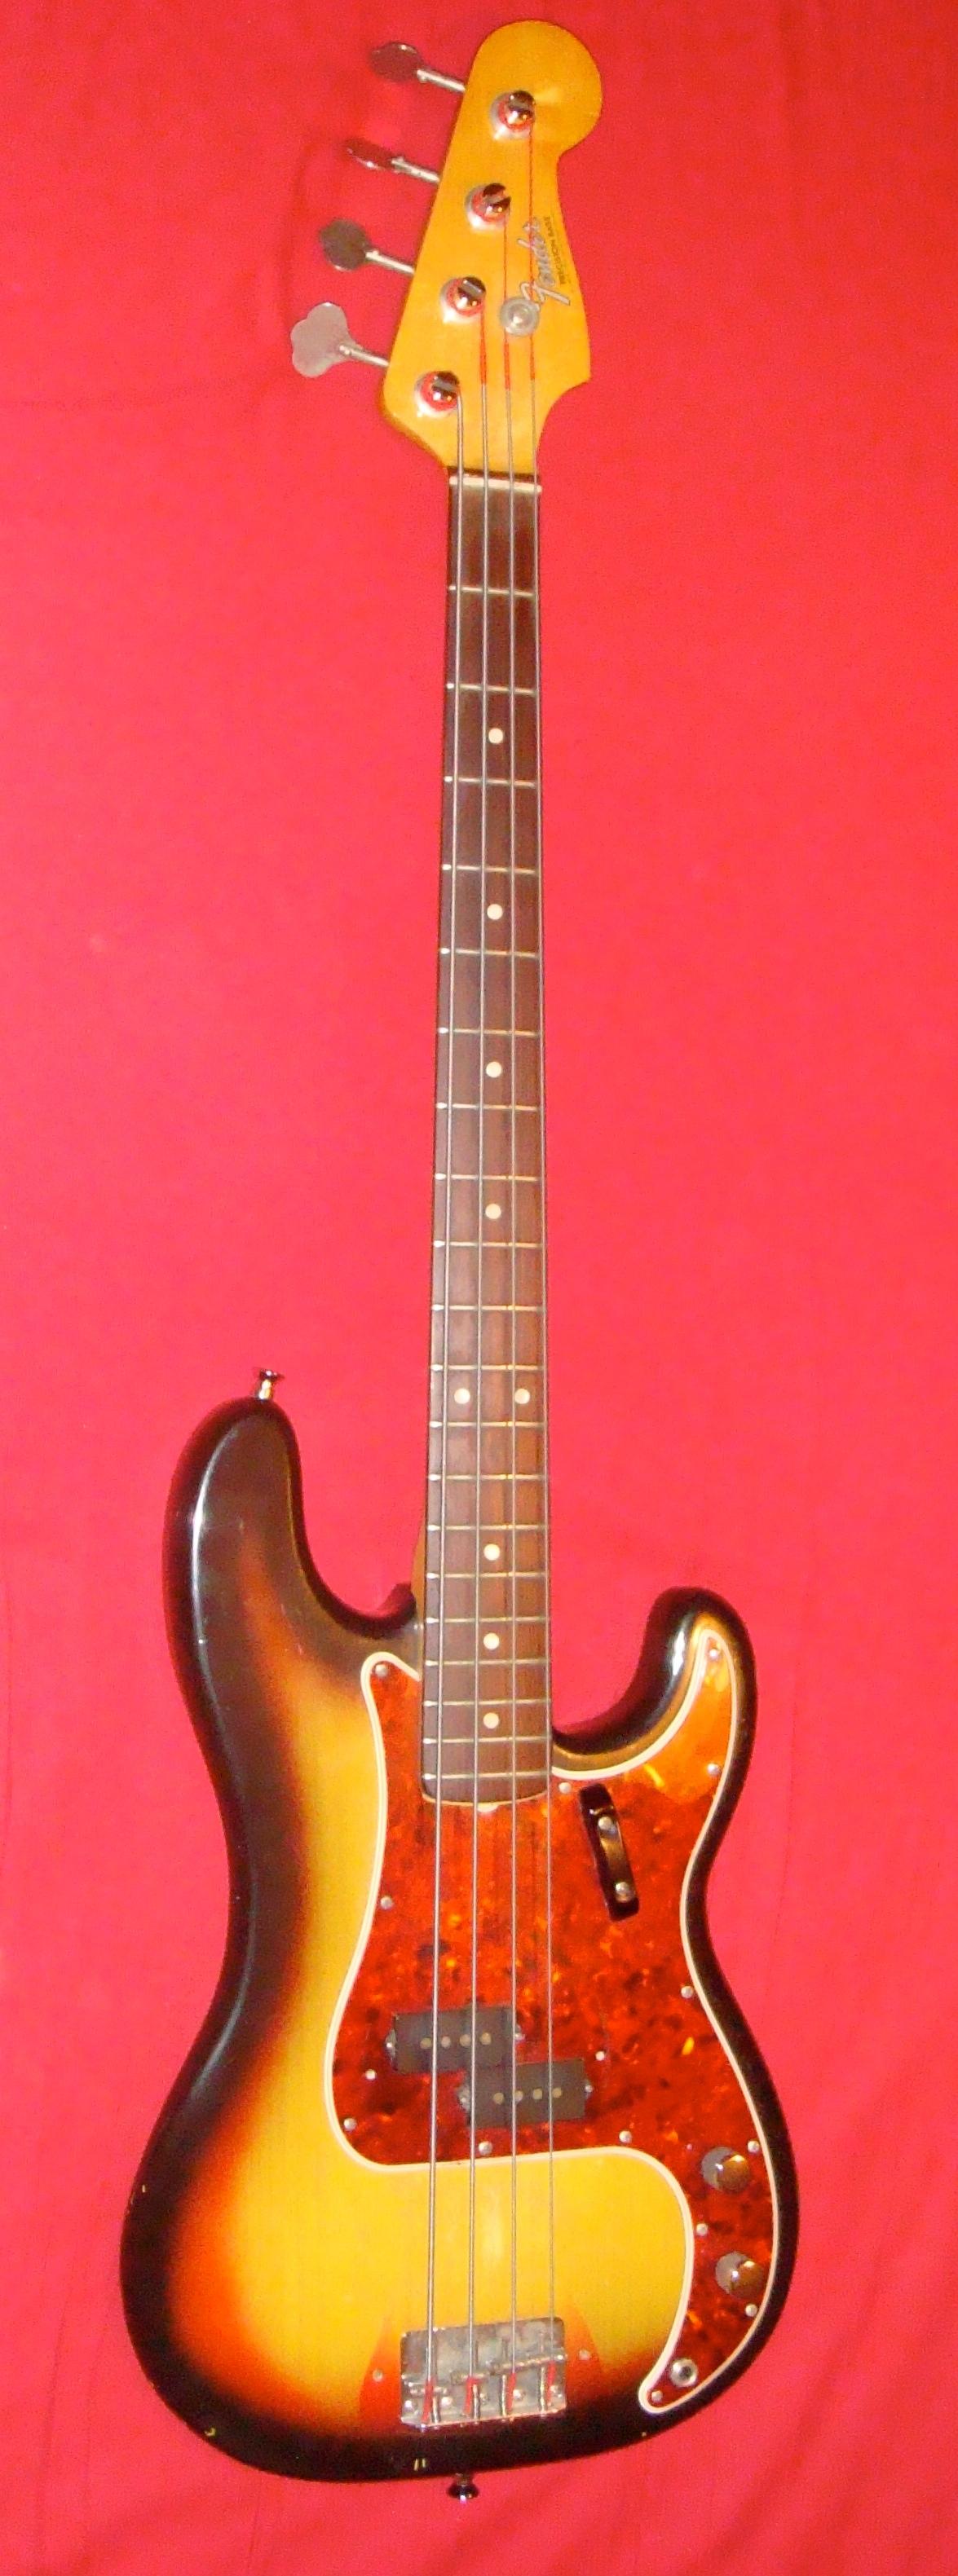 fender-precision-bass-vintage-698352.jpg